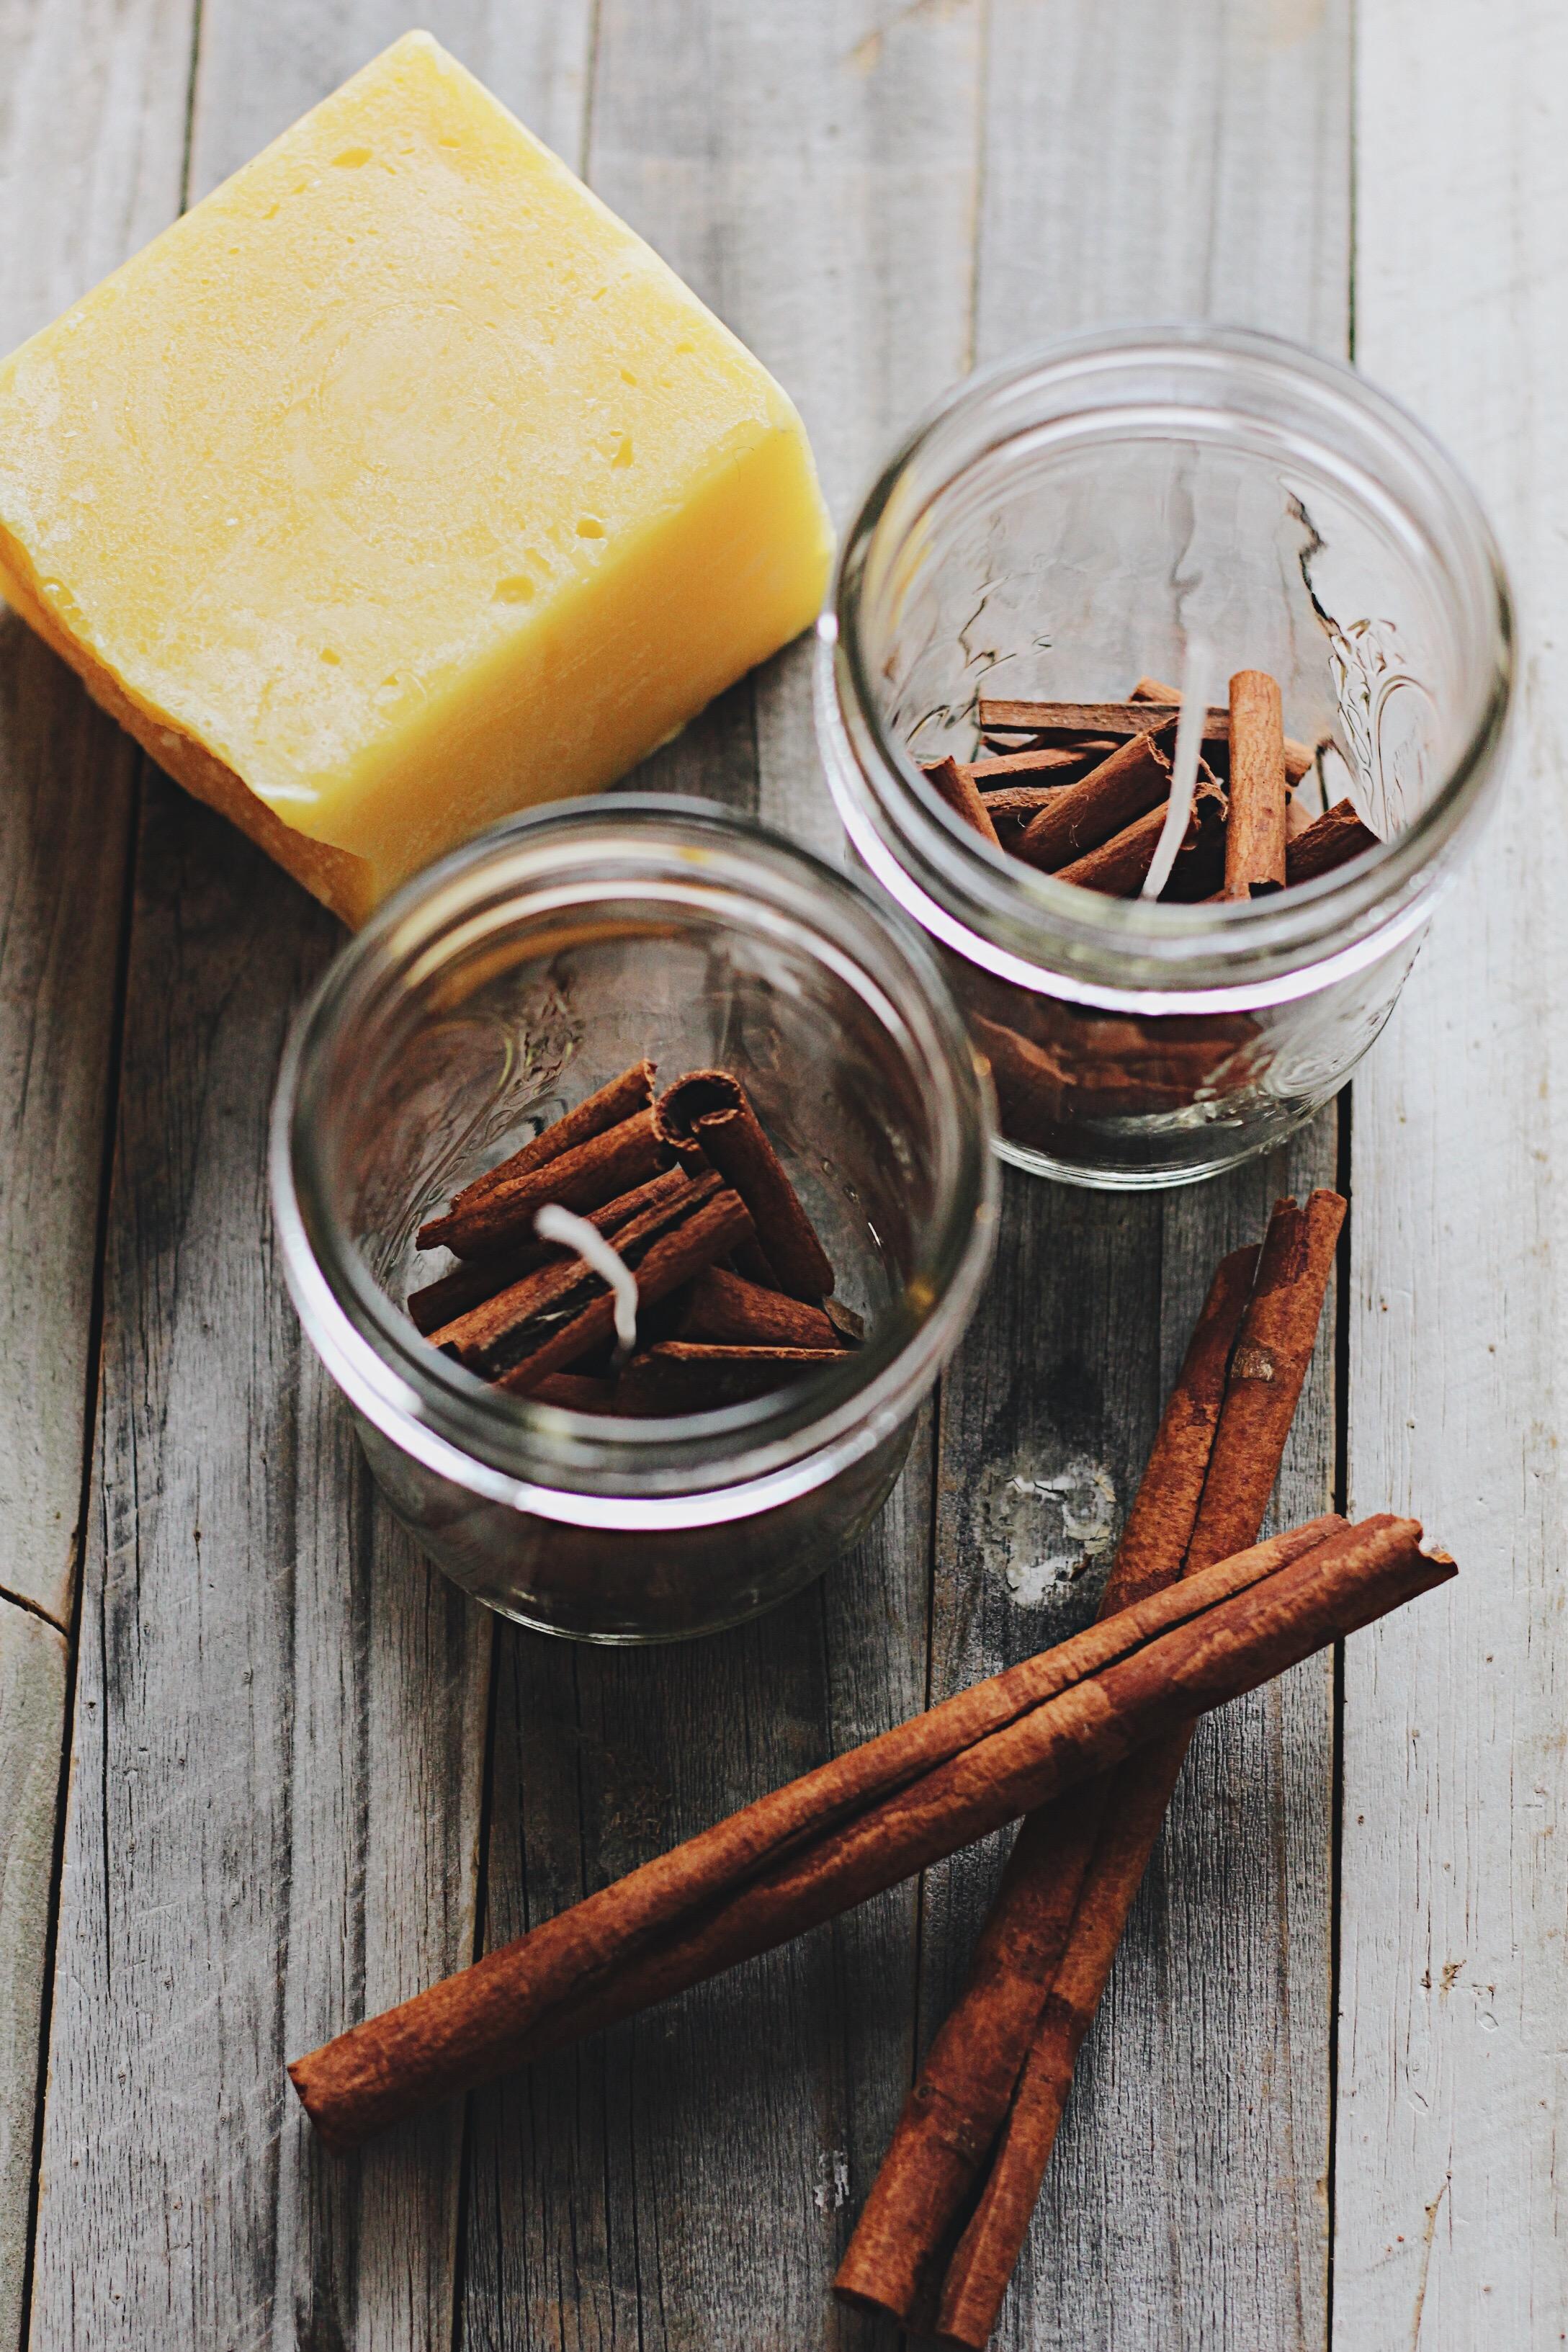 Cinnamon + Honey Beeswax Candles